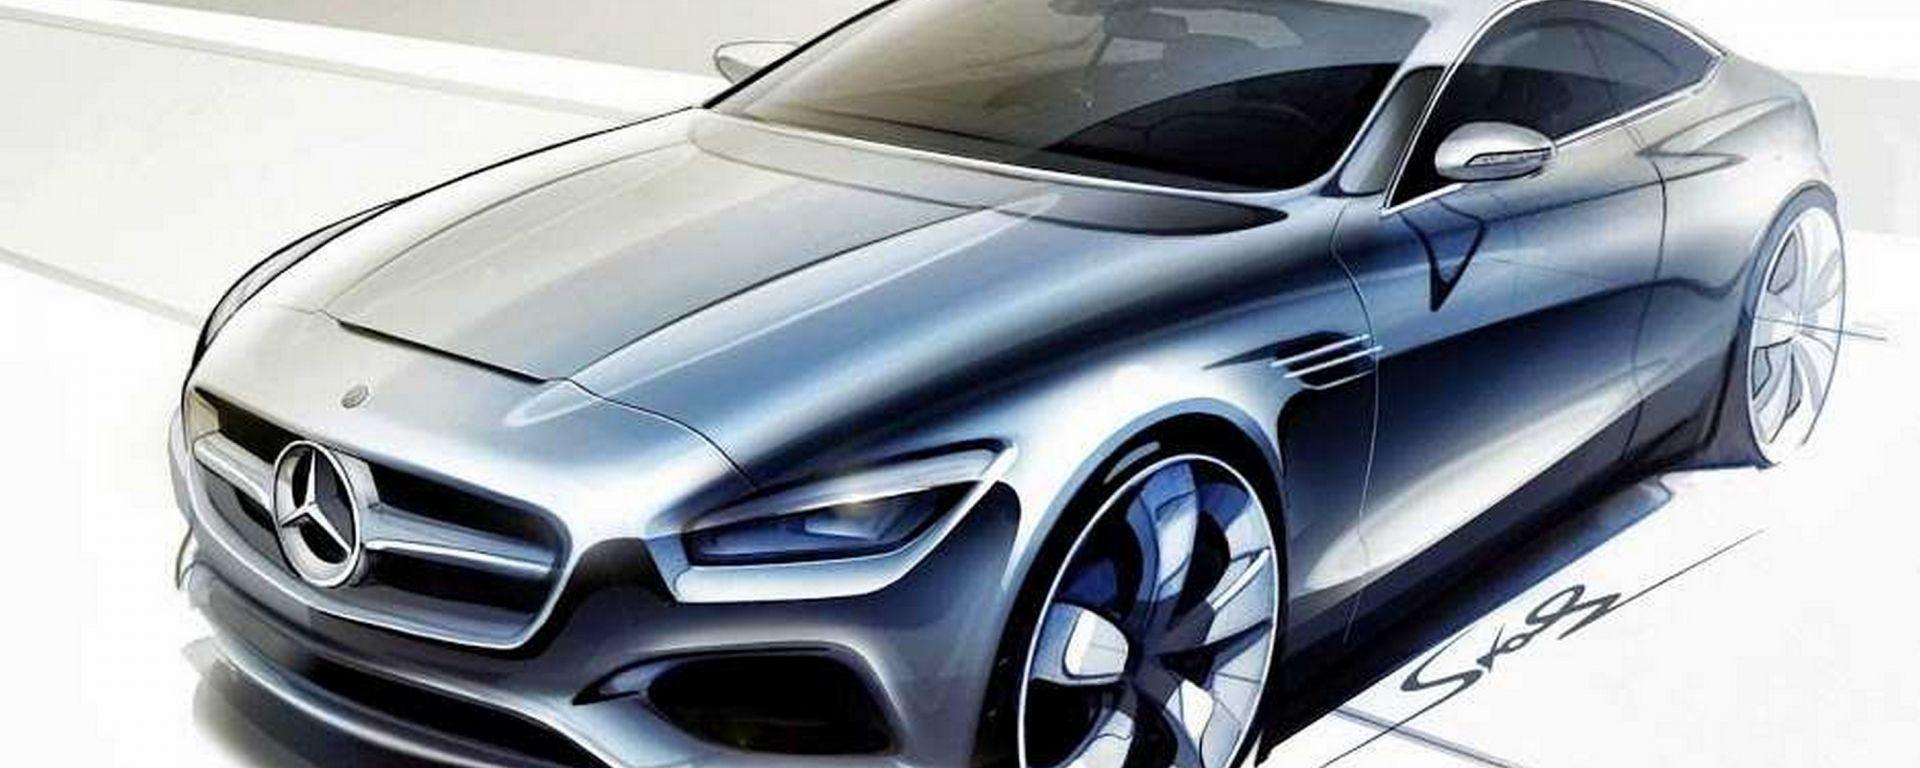 Mercedes Classe S: in arrivo l'elettrica anti-Tesla Model S?